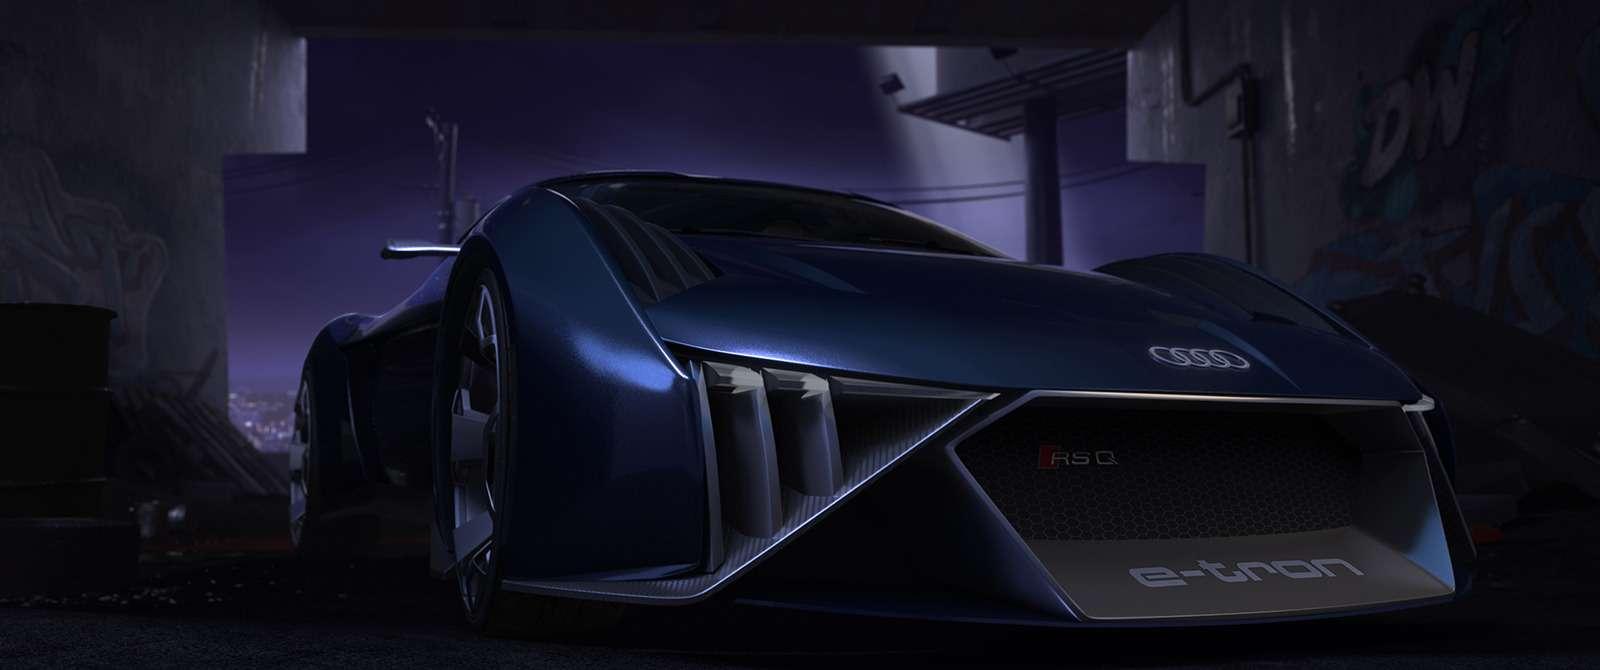 В Audi сделали суперкар длянарисованного Уилла Смита— фото 919670